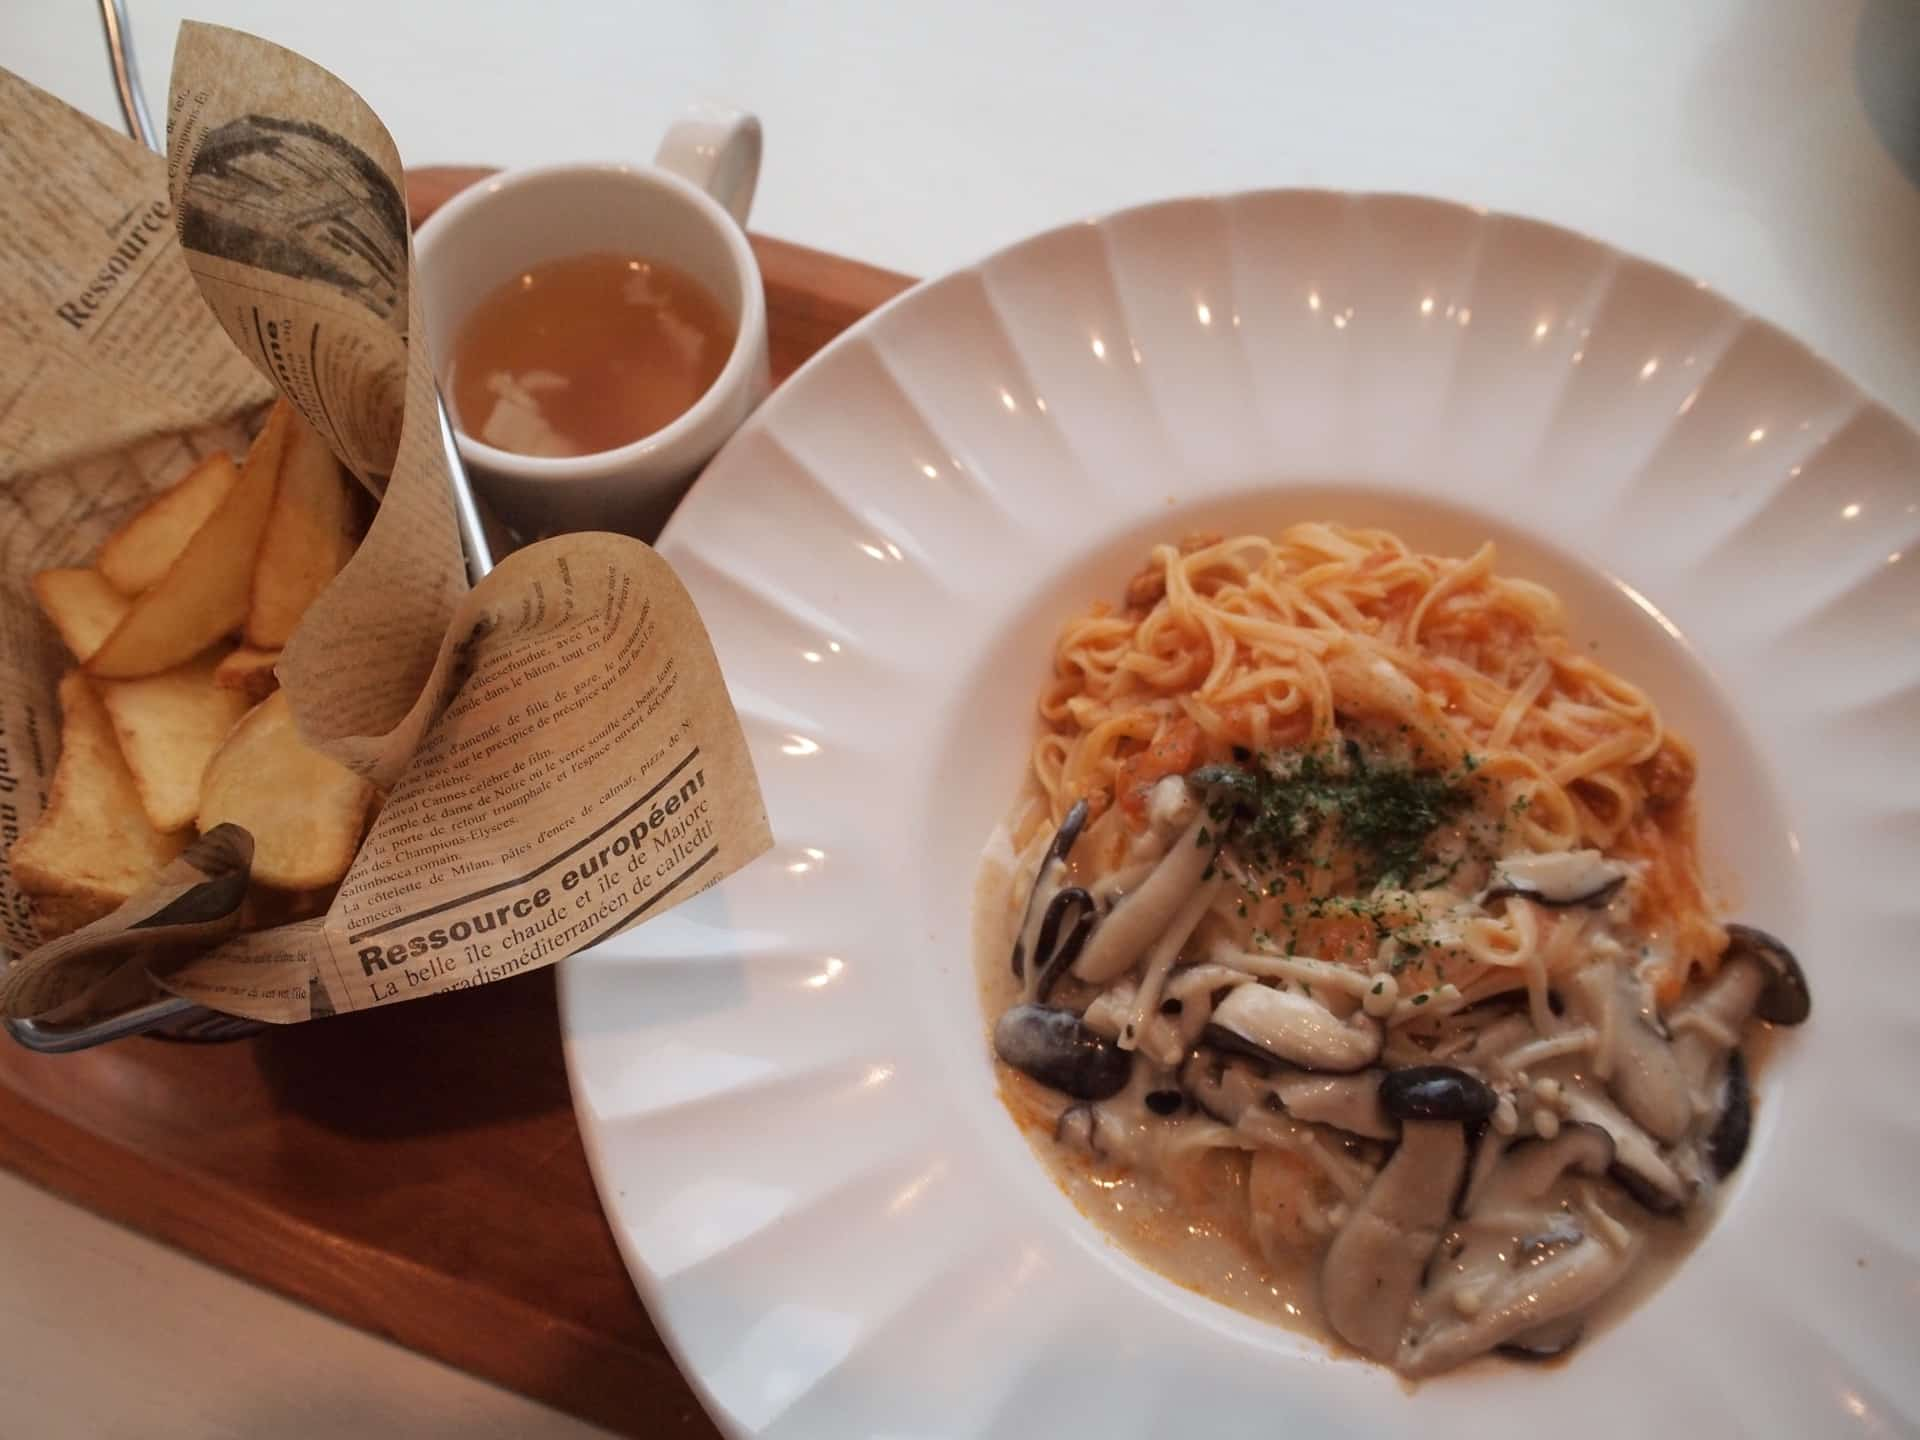 KICHIRI 渋谷宮益坂下 − バーニャカウダ食べ放題付きランチ!個室充実で子連れランチもOK